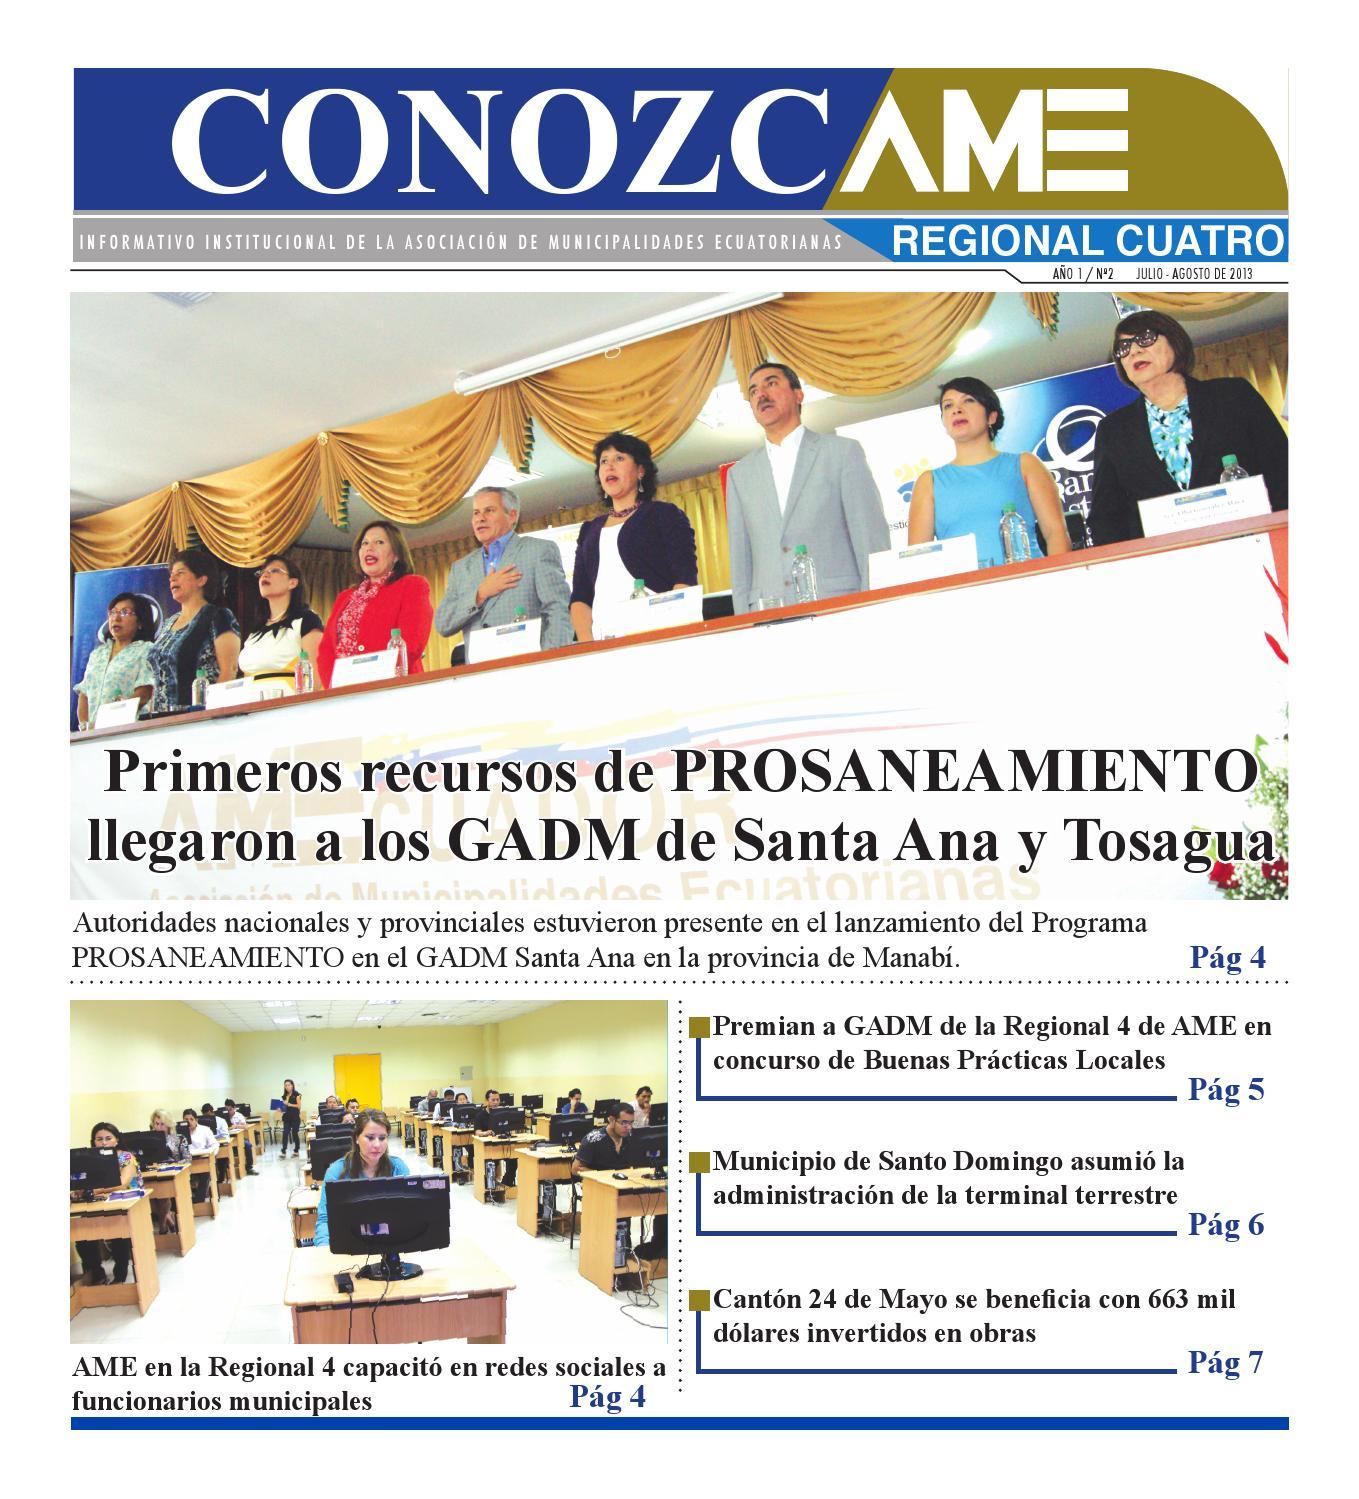 Conozcame regional 4 junio 2013 by AMEcuador - issuu 0184ca47182